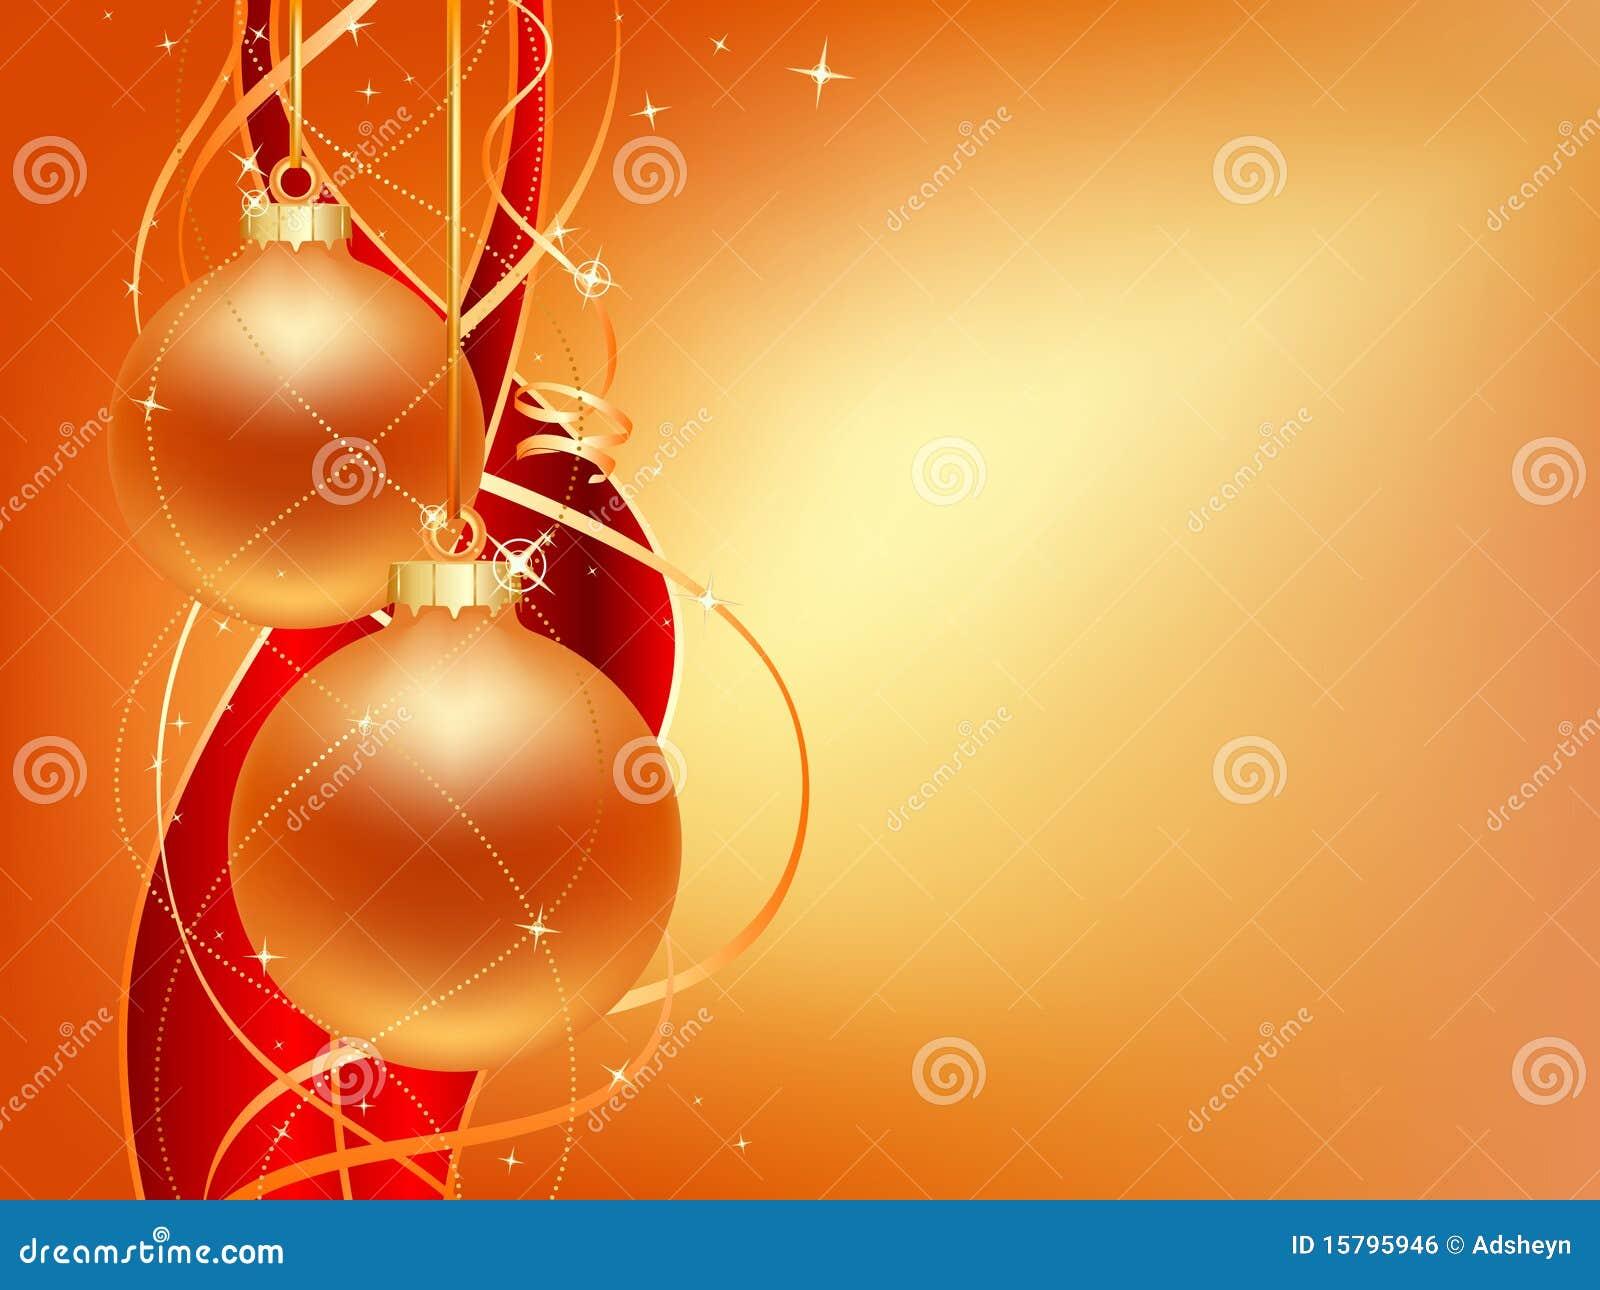 Gold Christmas Card Royalty Free Stock Image - Image: 15795946